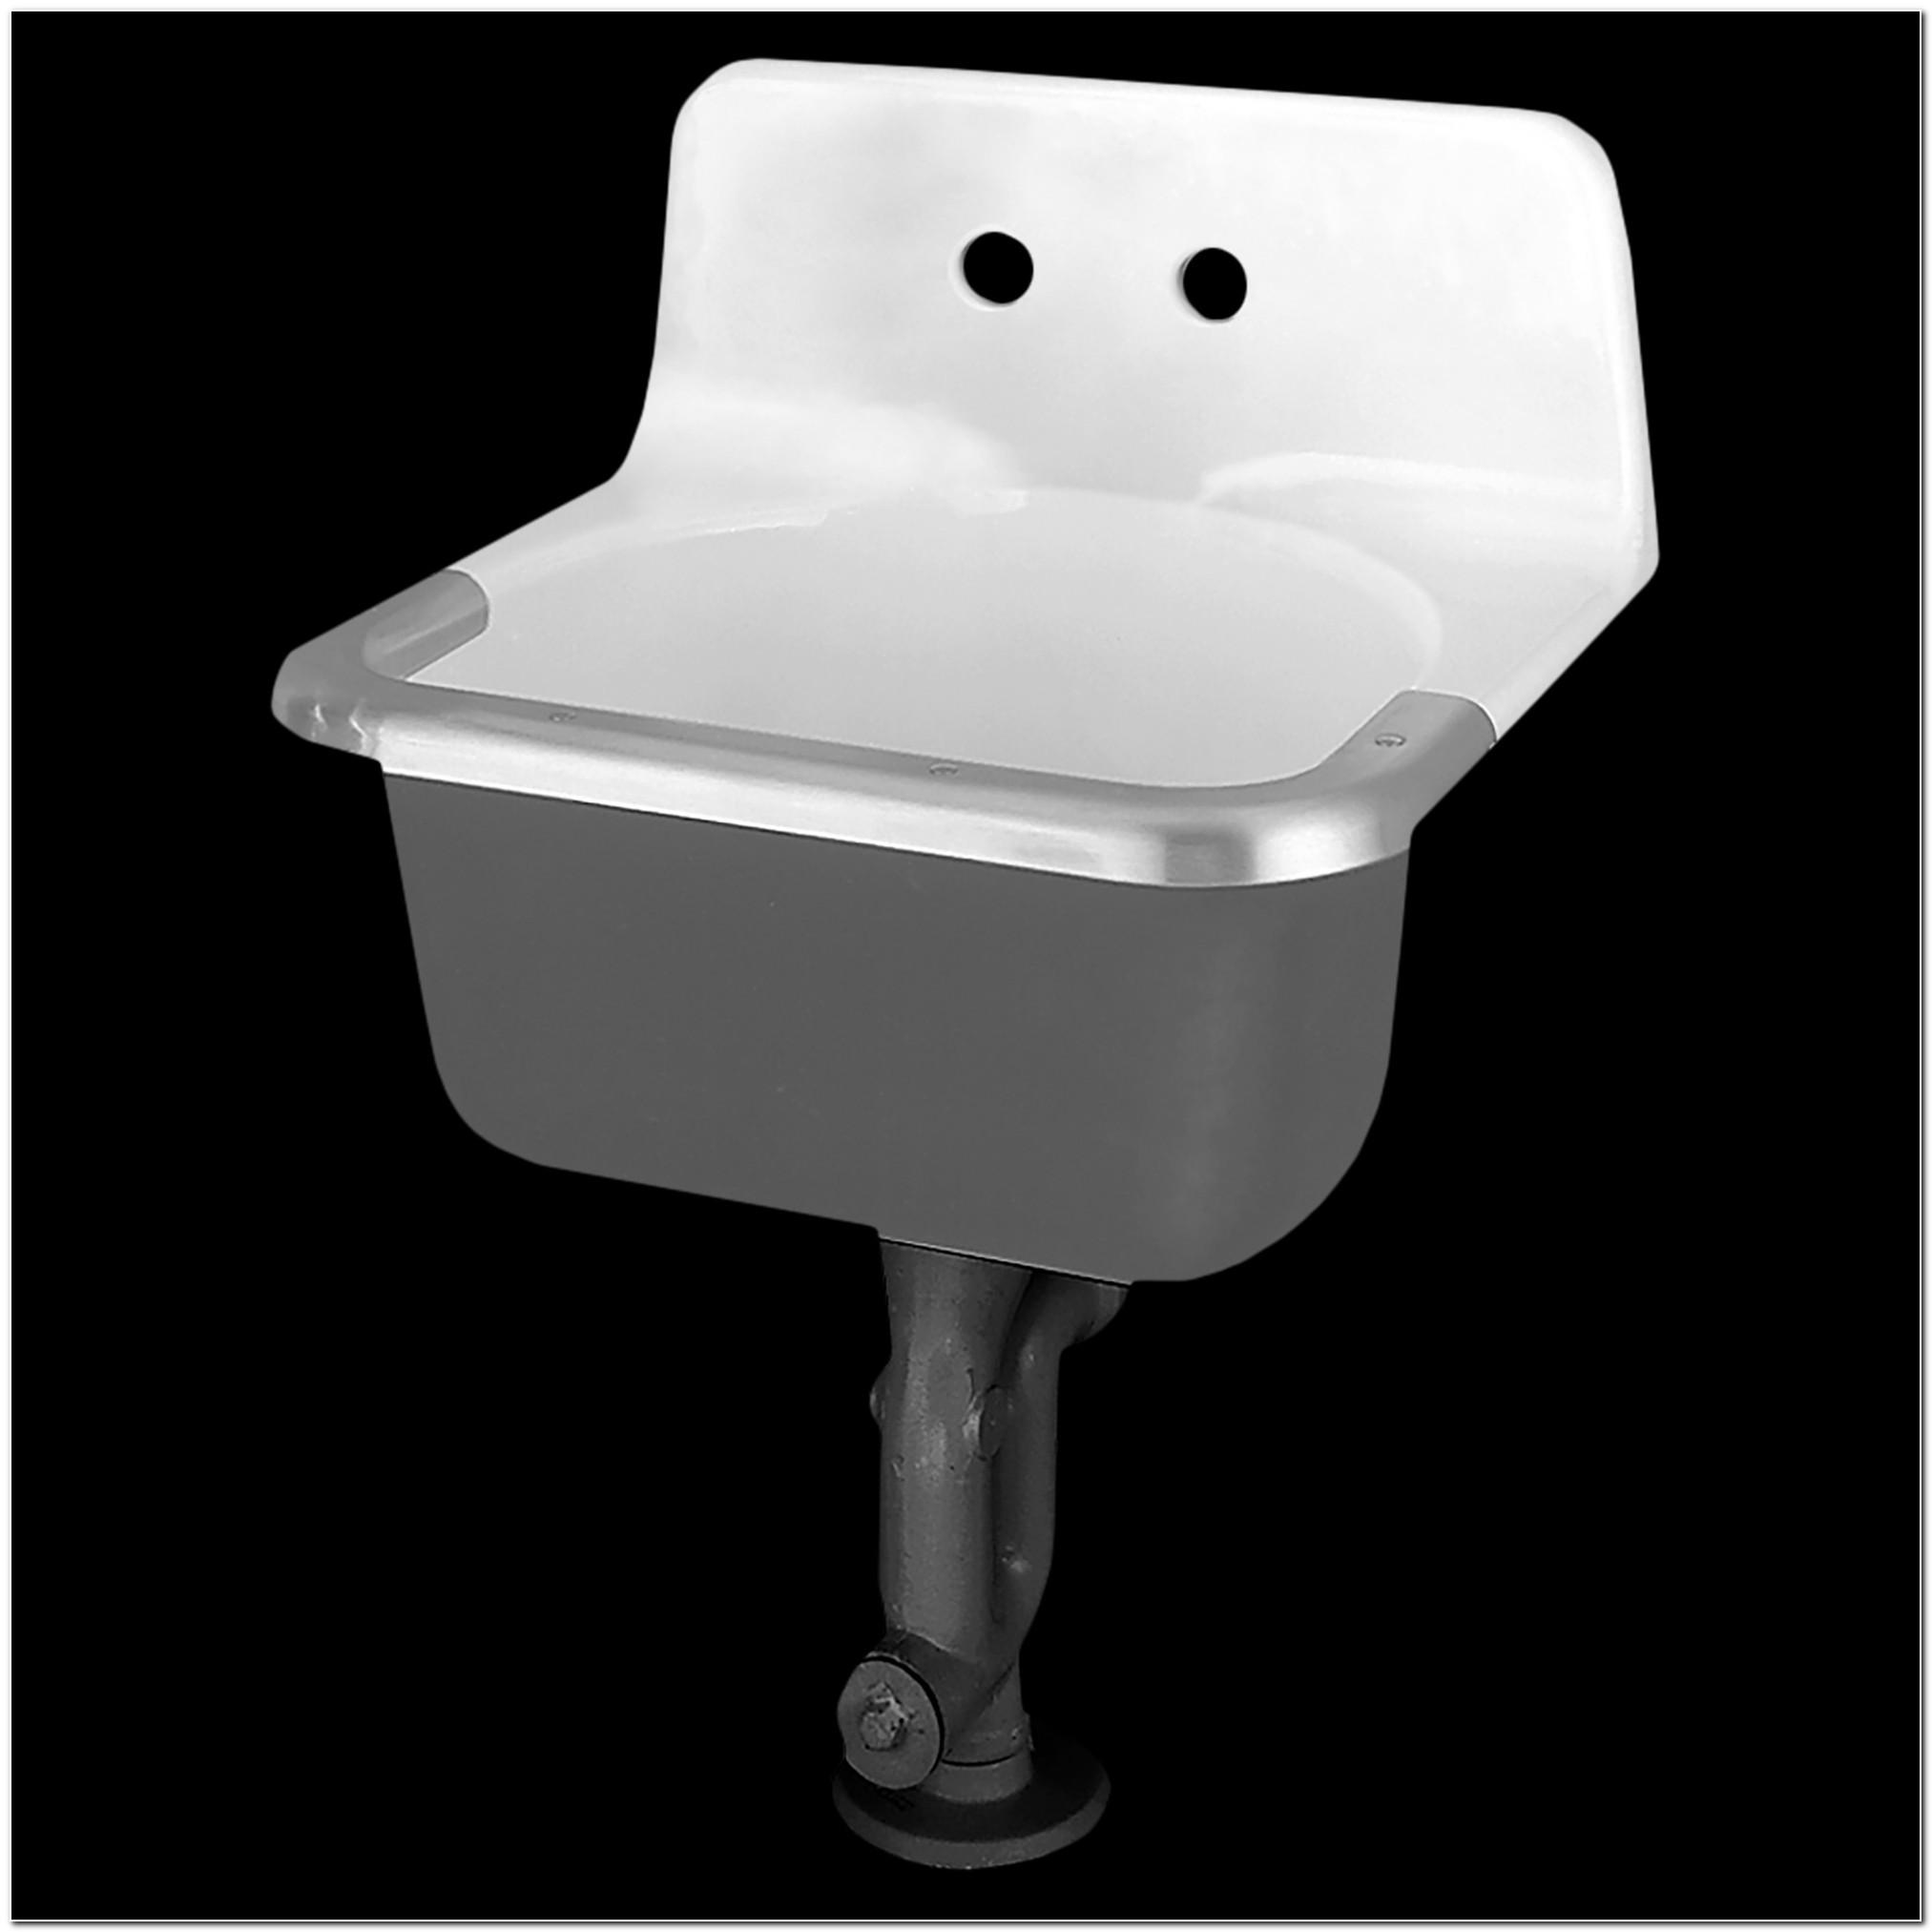 Cast Iron Service Sink Drain